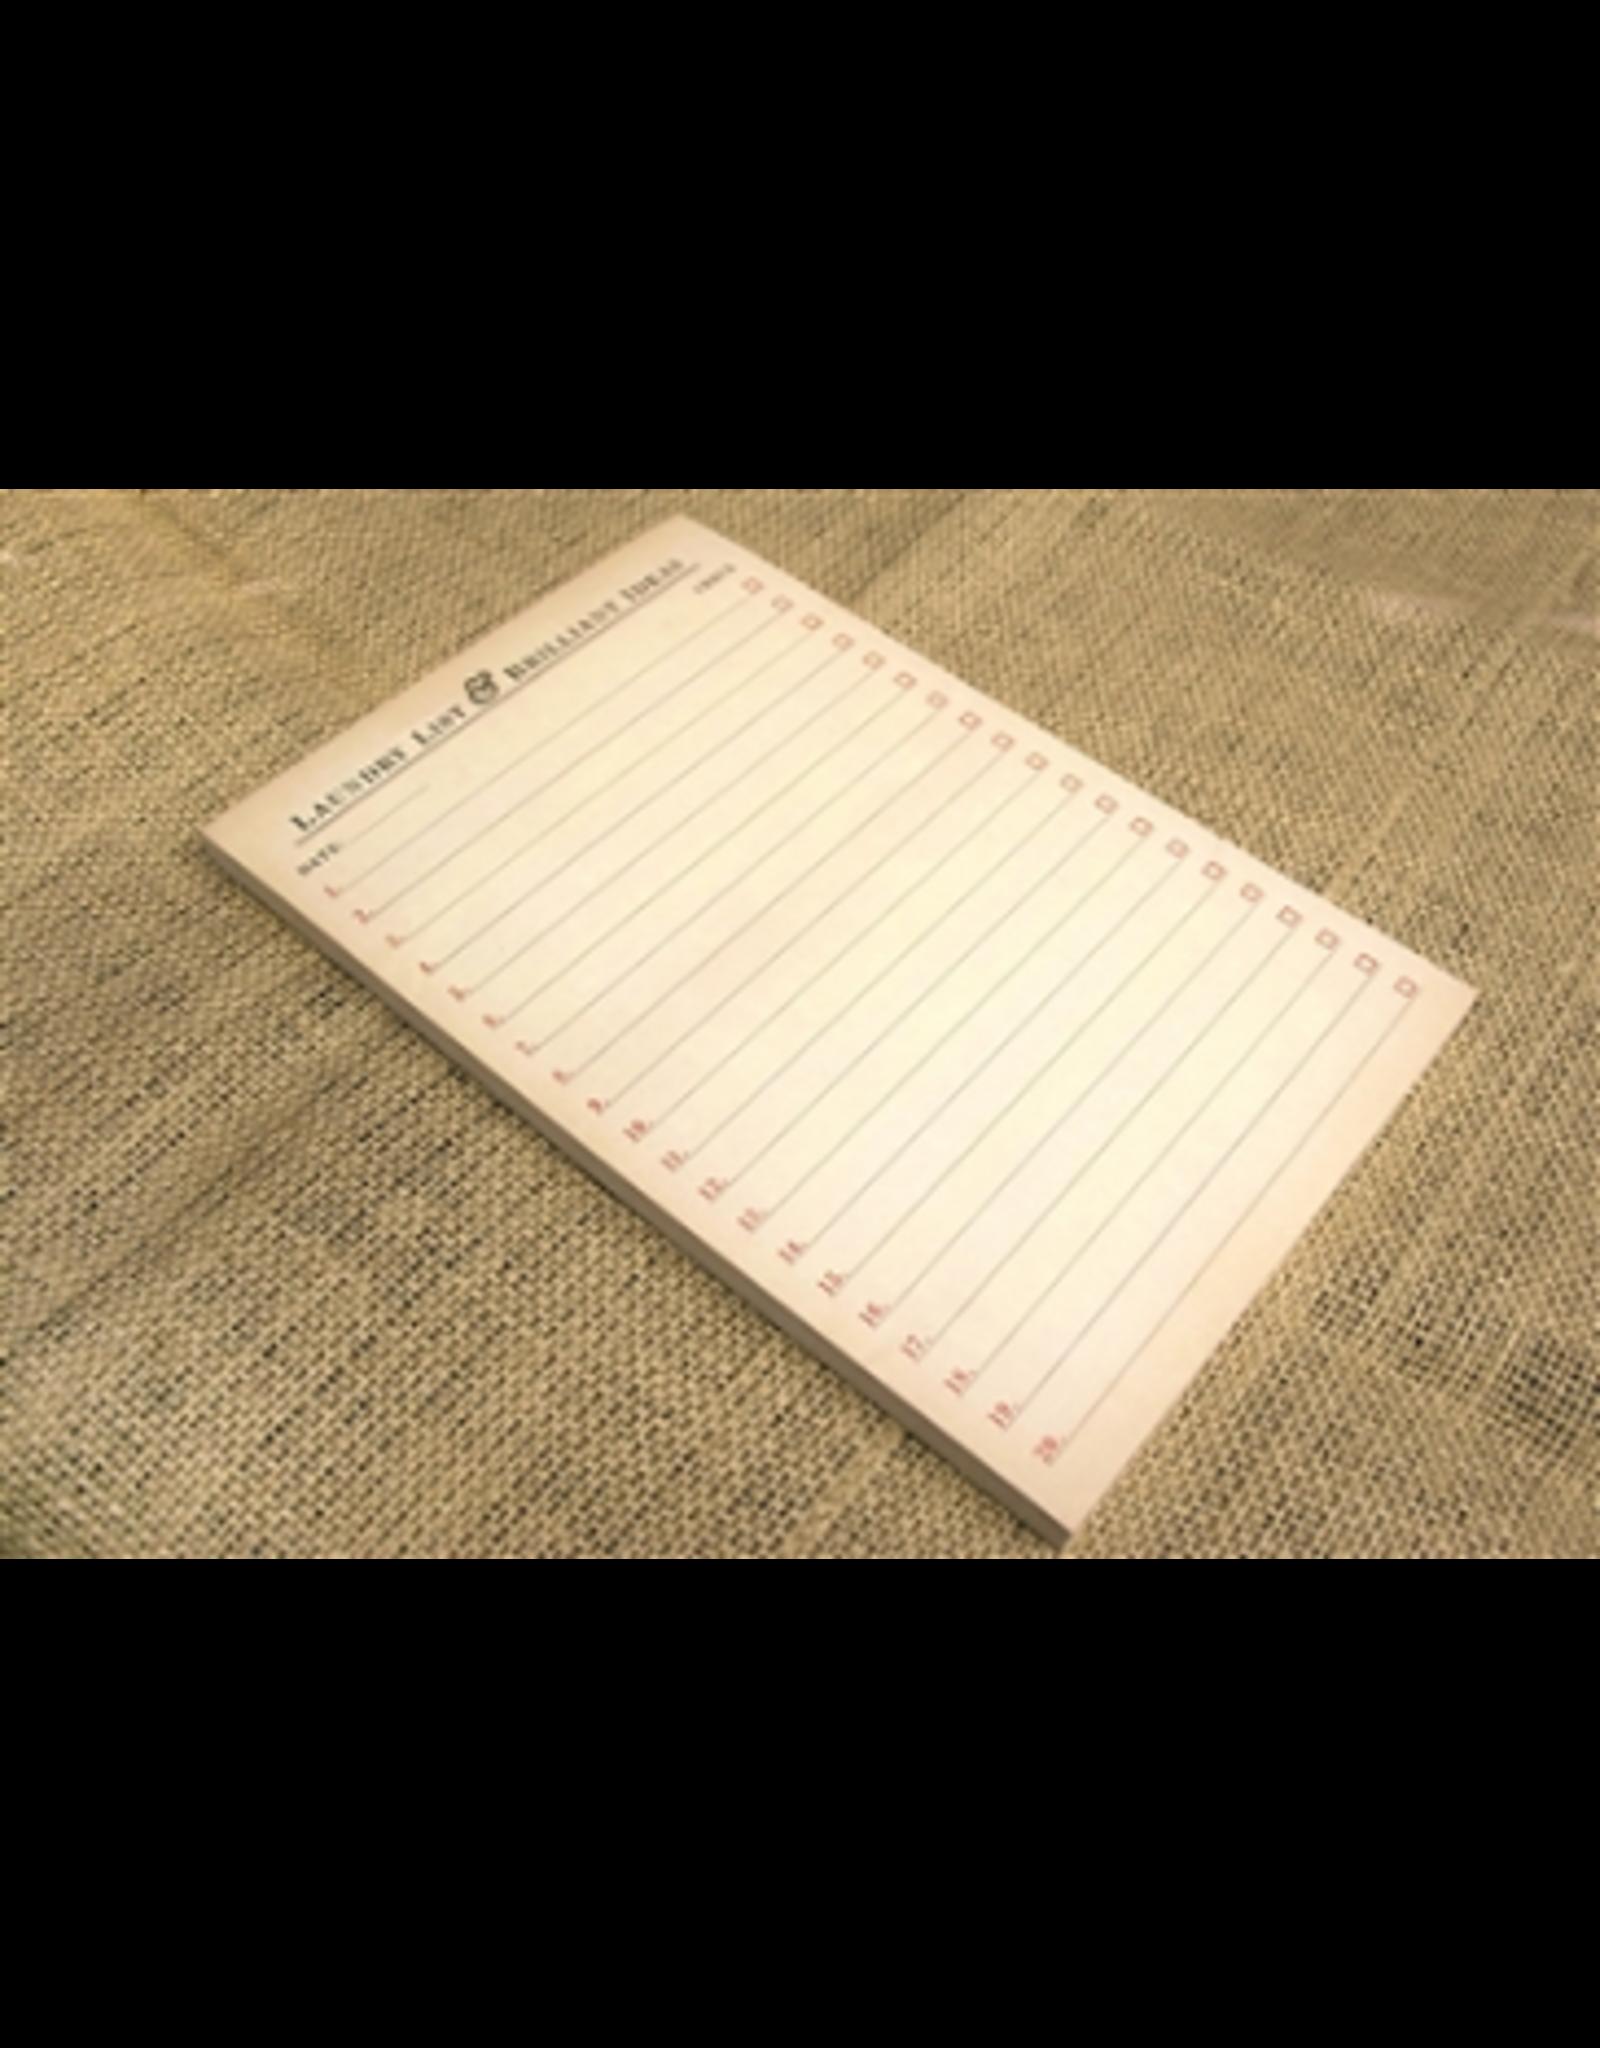 Sugarboo & Co Laundry List & Brilliant Ideas Notepad